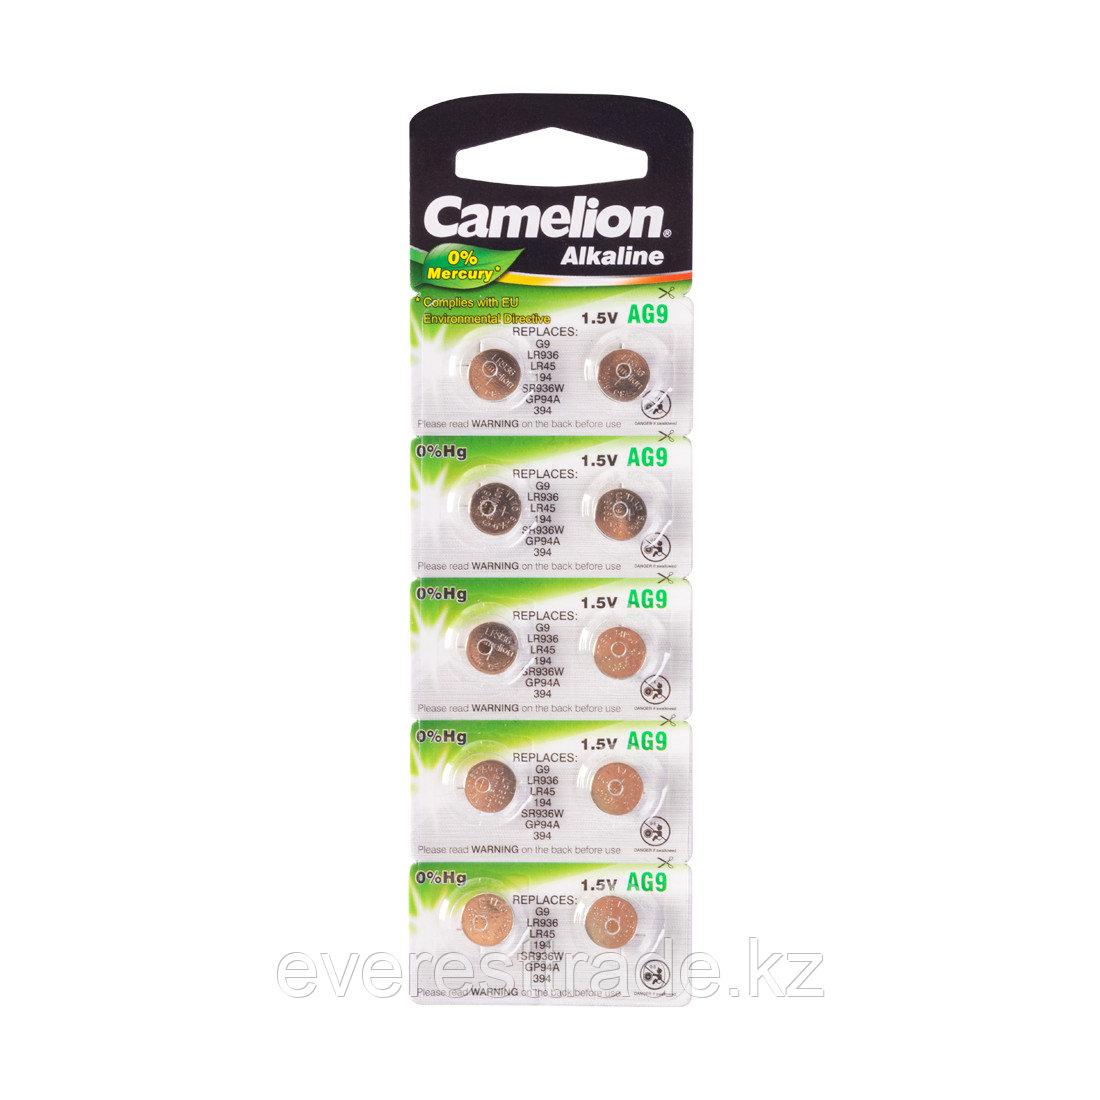 Camelion Батарейки,CAMELION, AG9-BP10, Alkaline, AG9, 1.5V, 0% Ртути, 10 шт. в блистере